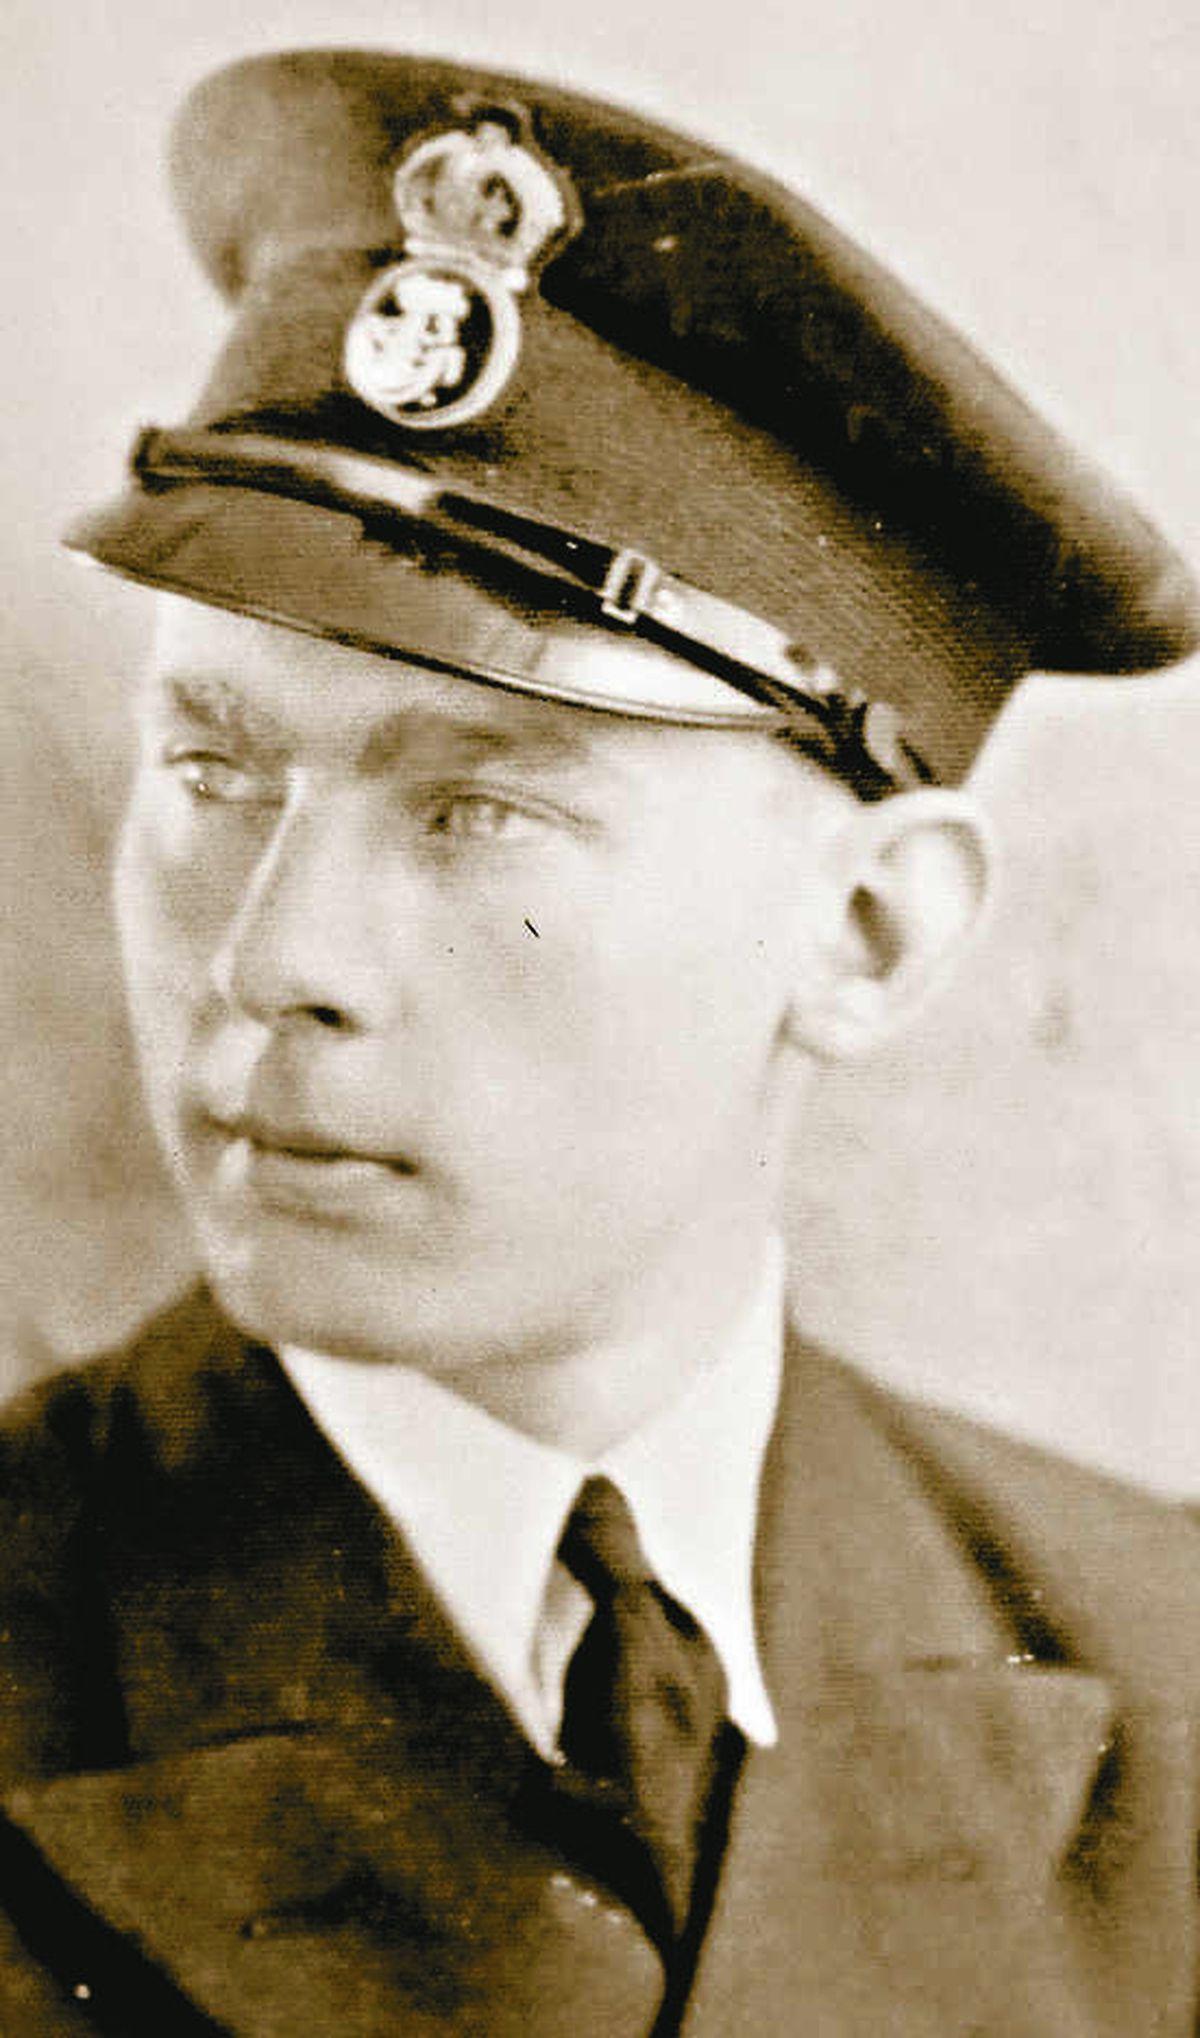 Farewell to last hero of St Nazaire World War II Raid